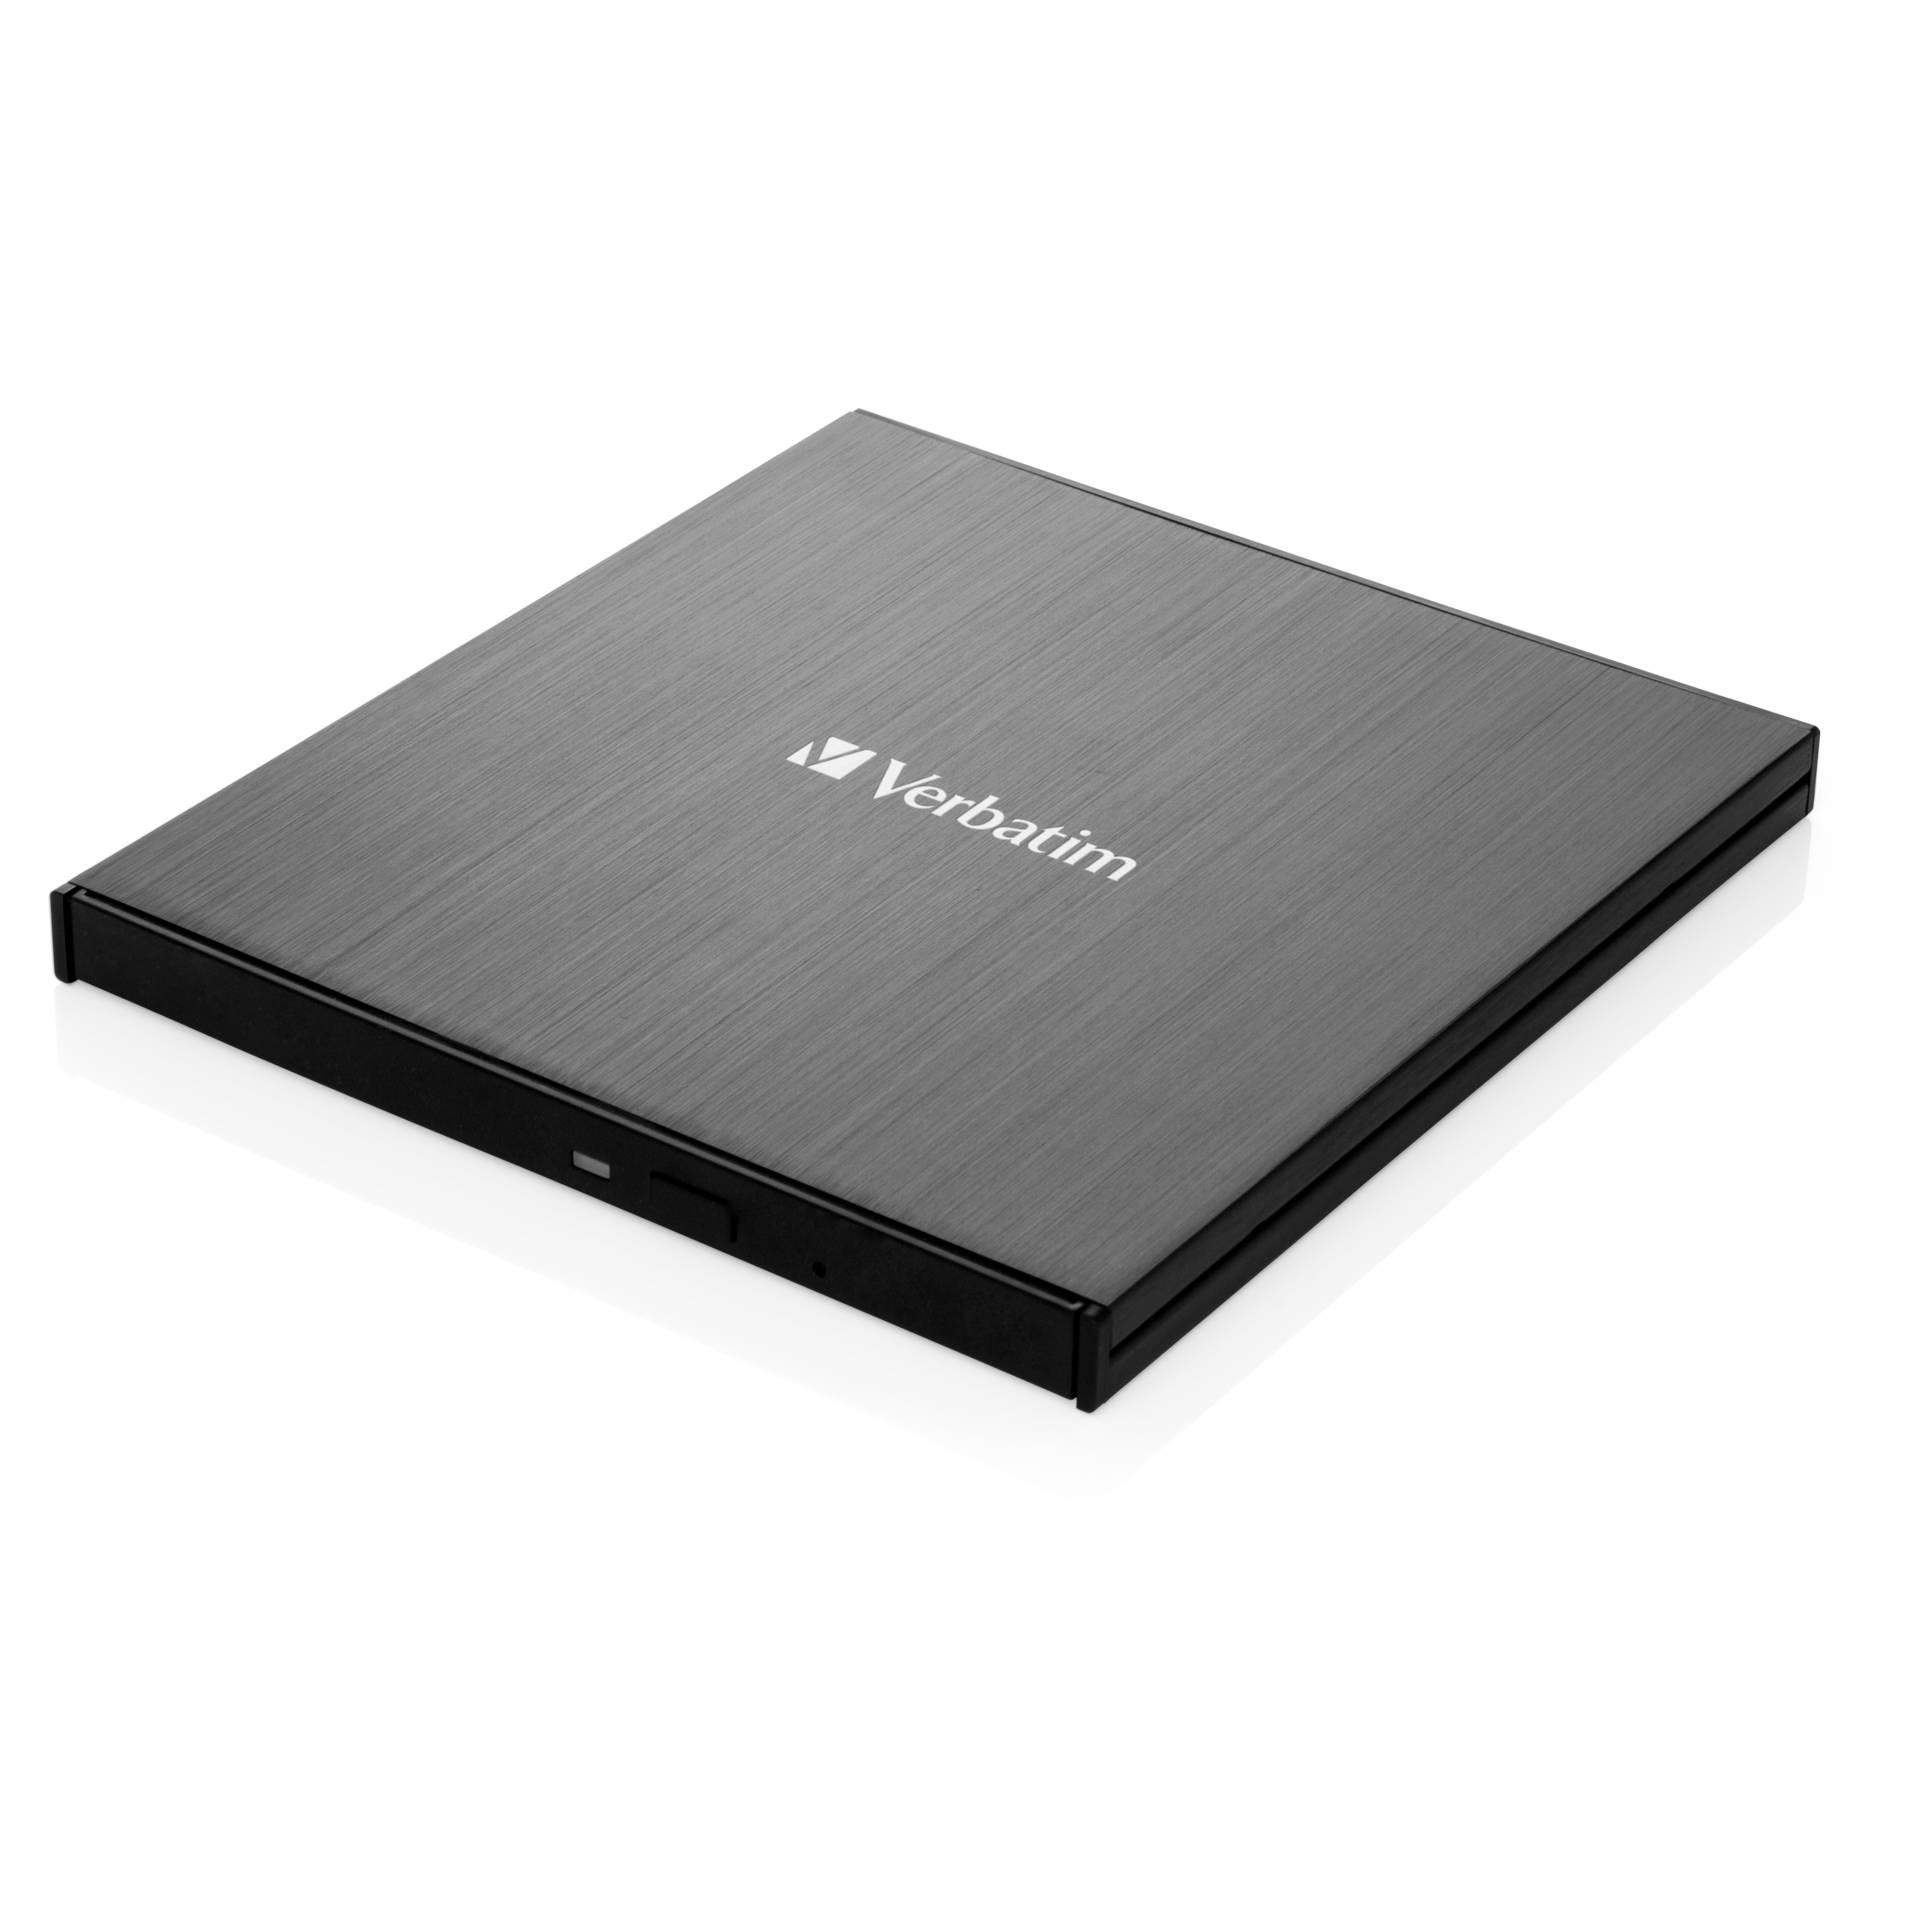 Verbatim Slimline Blu-ray Writer USB 3.1 GEN 1 USB-C Ultra HD 4K